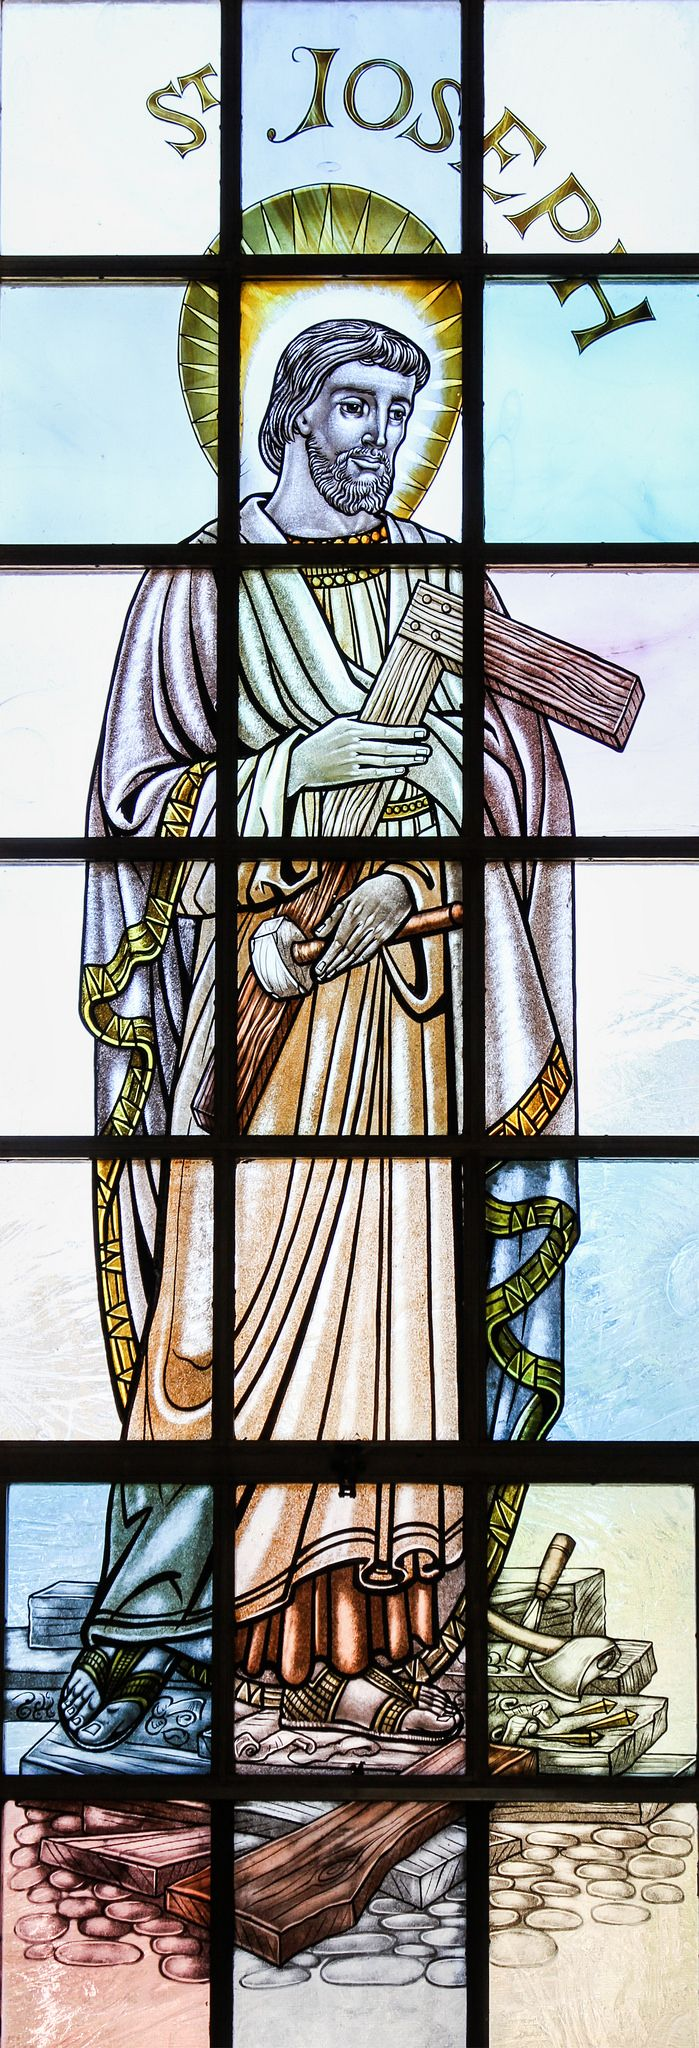 Saint Joseph the Carpenter / San José Carpintero // Stained glass window from the Catholic chapel of Dartmouth College. // photo. Lawrence OP